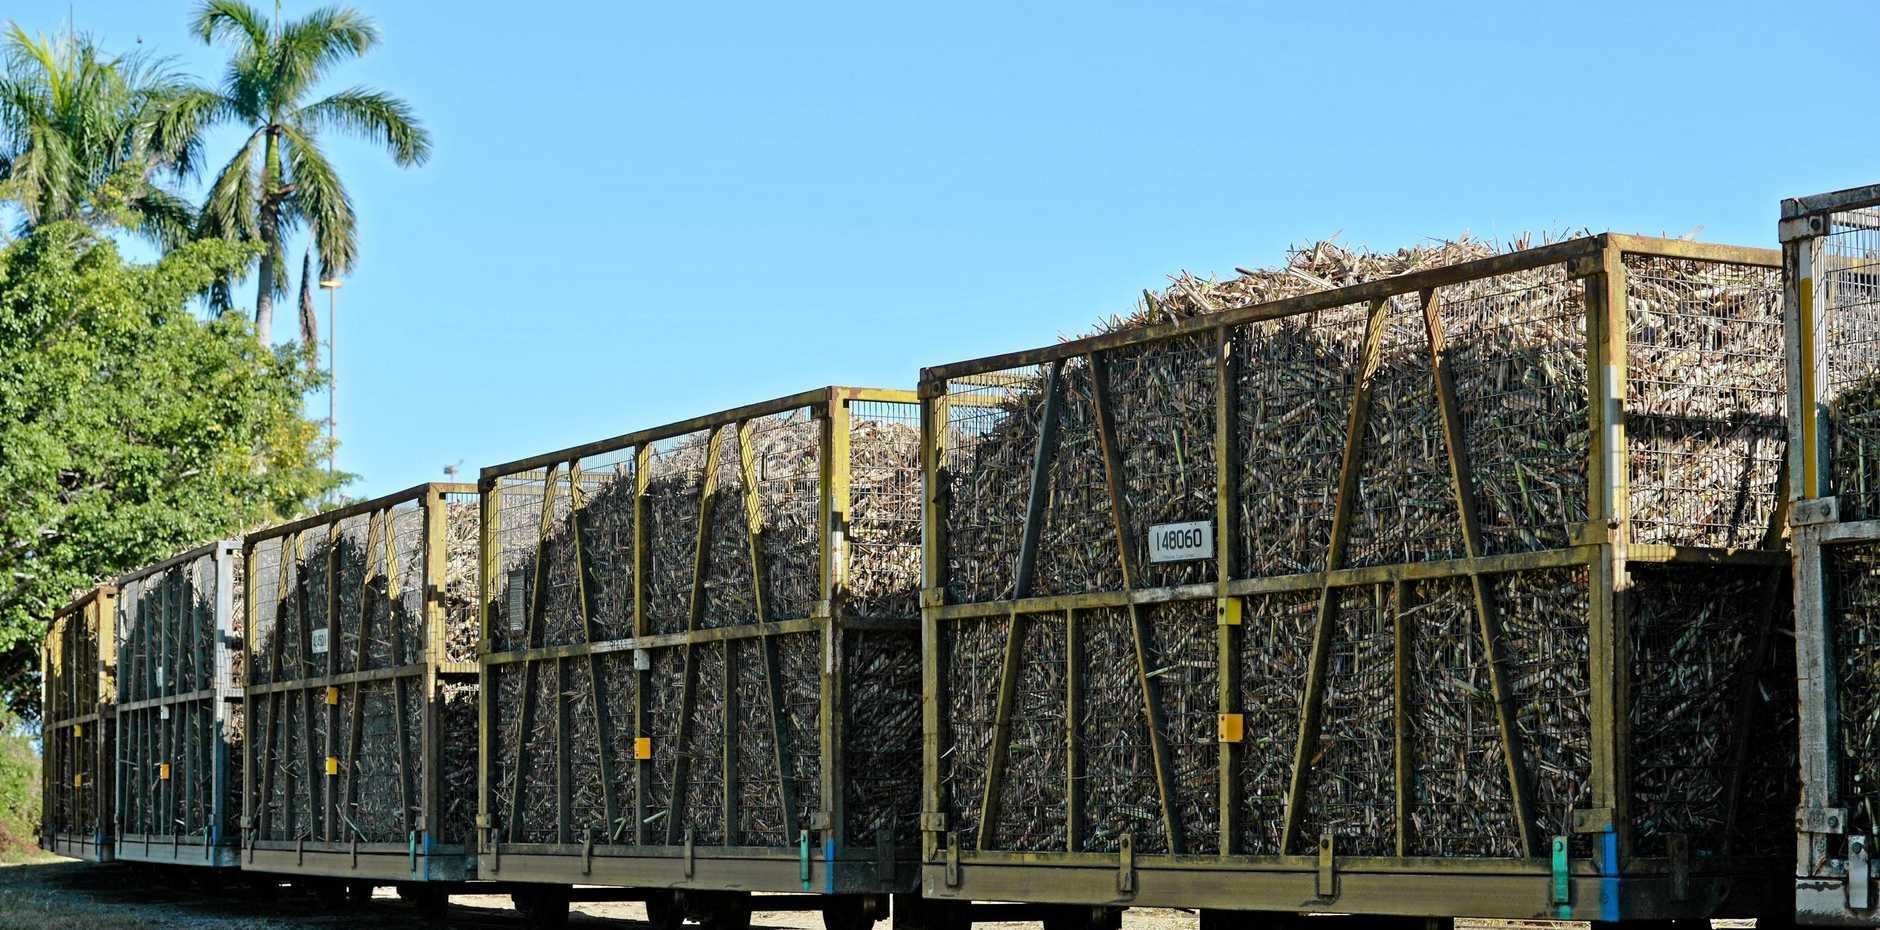 Full cane train bins at the Pleystowe Mill